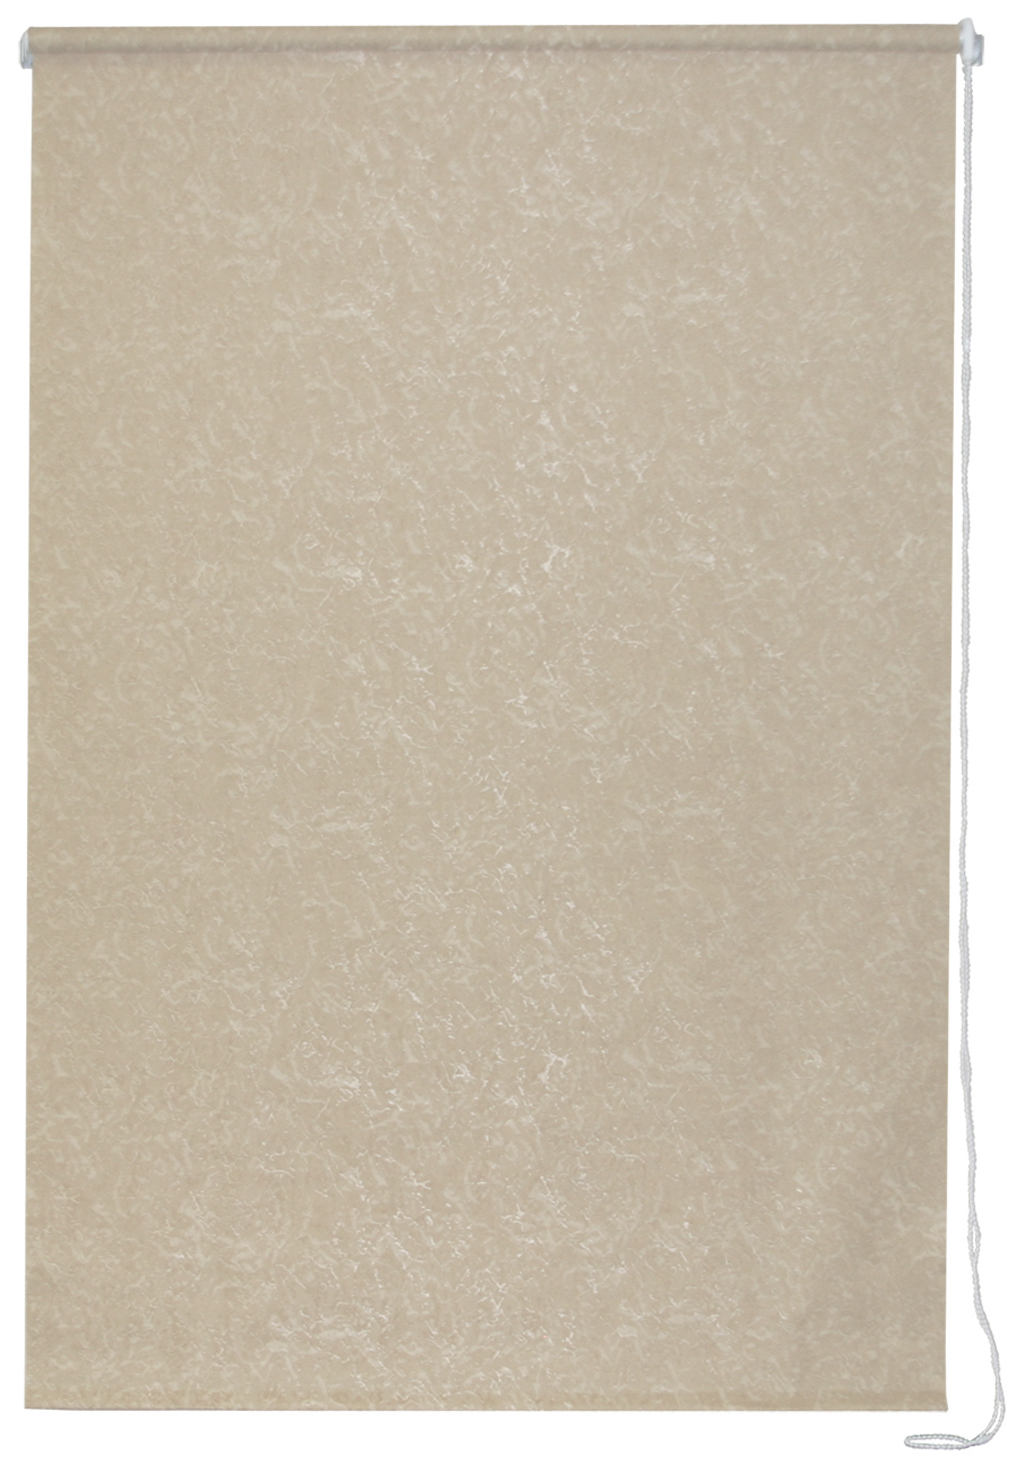 Рулонная штора УЮТРулонные шторы<br>Коллекция: Фрост,<br>Материал: полиэстер,<br>Цвет: бежевый,<br>Размеры: 700х1750,<br>Ширина: 700,<br>Высота (см): 175<br>